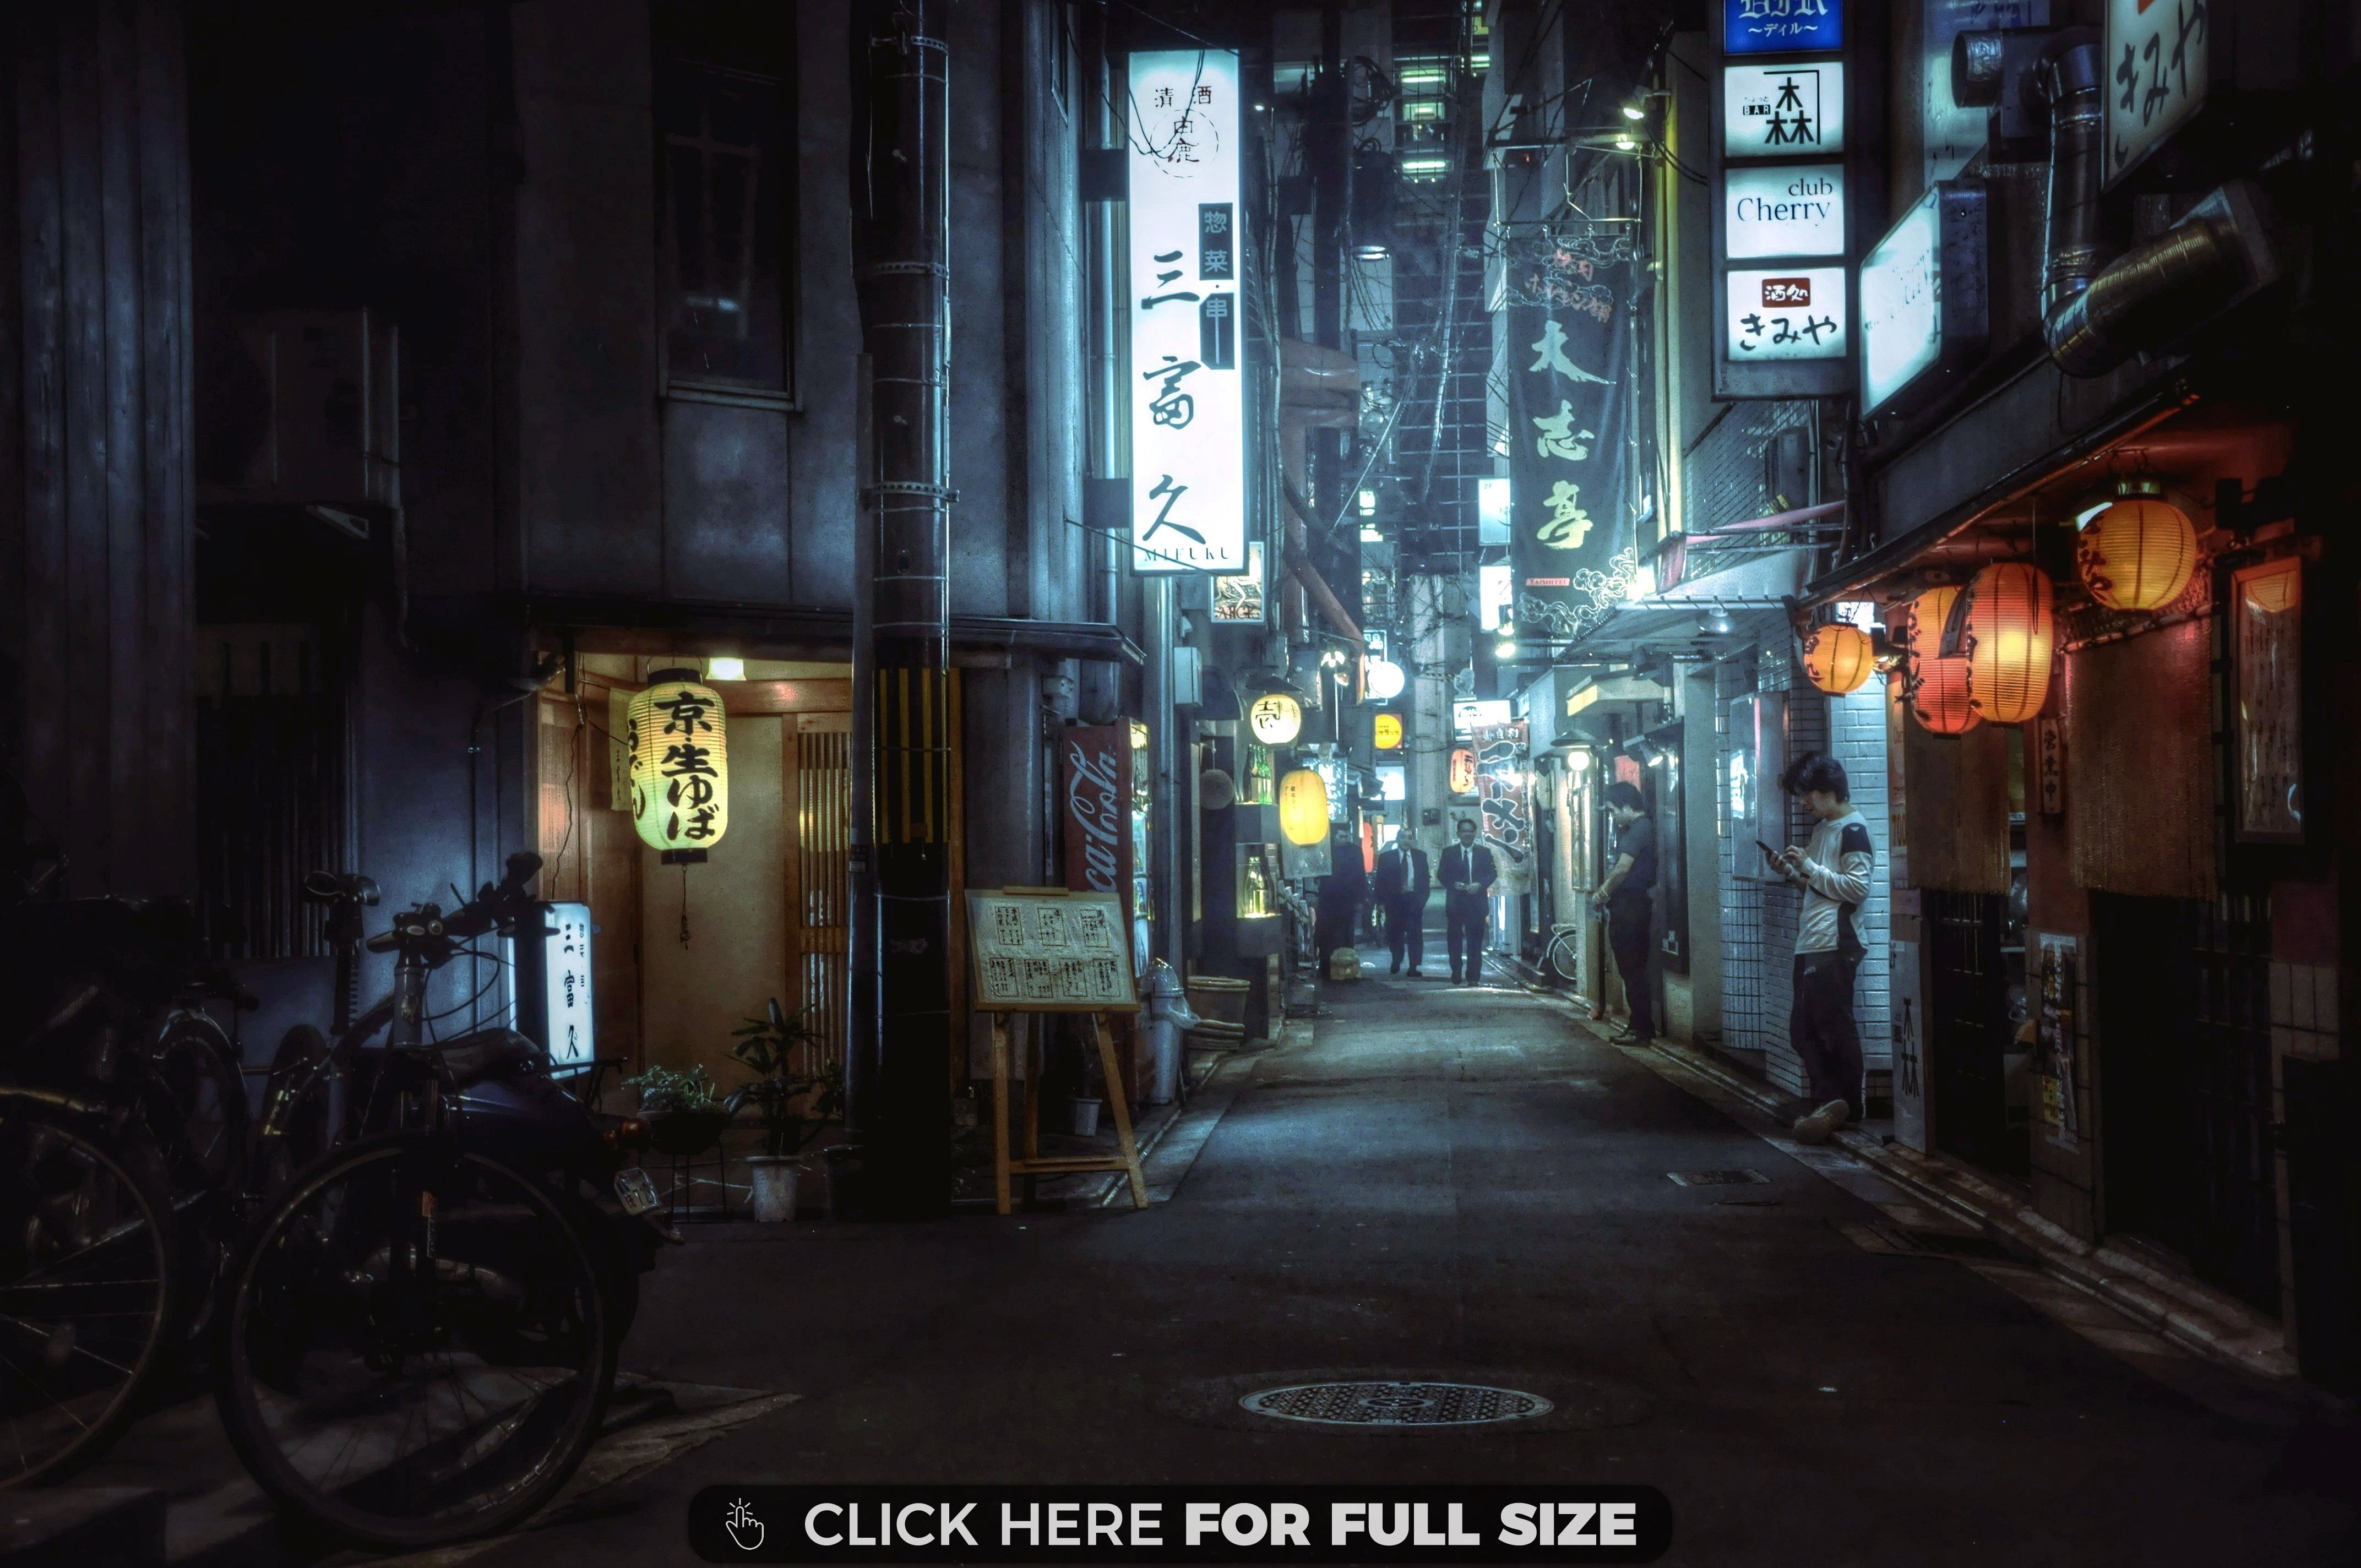 Tokyo Night Night Tokyo Wallpapers 4k Free Iphone Mobile Games City Aesthetic City Wallpaper Tokyo Night